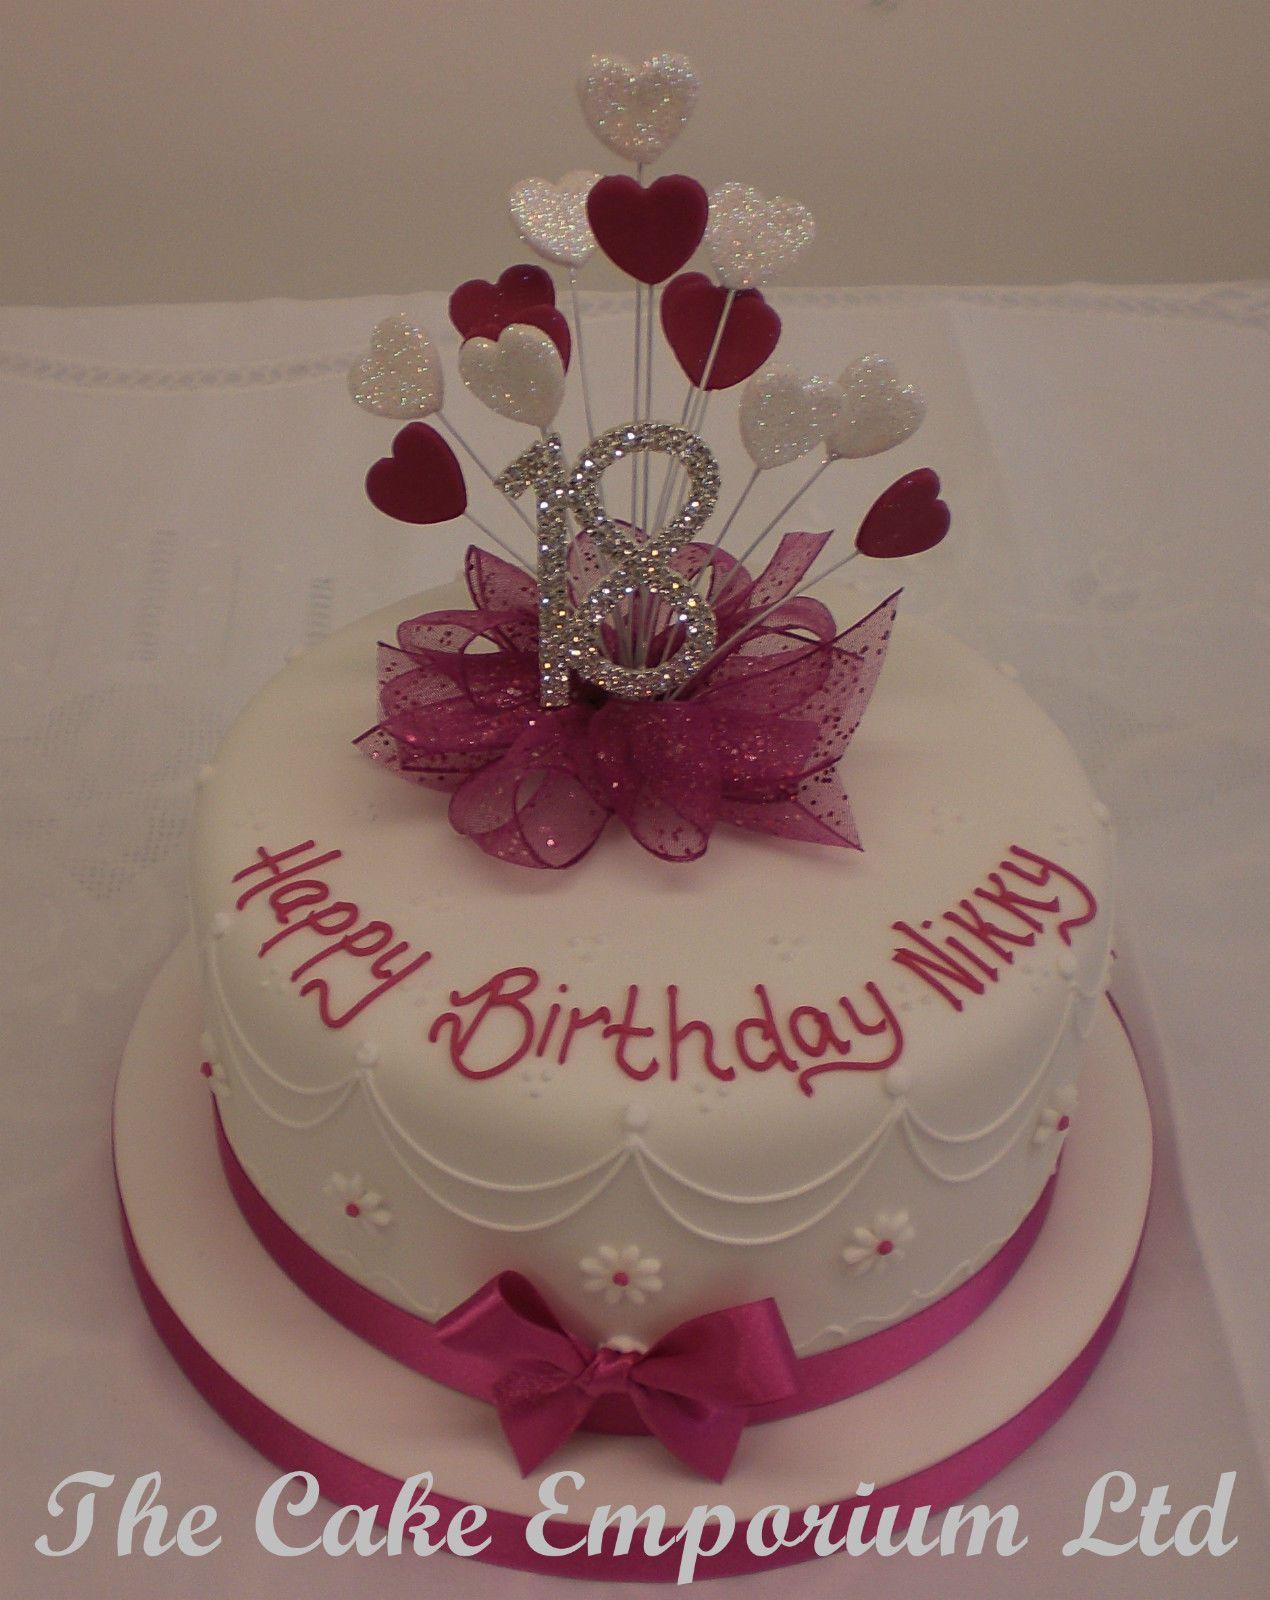 CAKE TOPPER HEART BURST SPRAY DIAMANTE BIRTHDAY ANNIVERSARY NUMBERS FUCHSIA In Crafts Cake Decorating